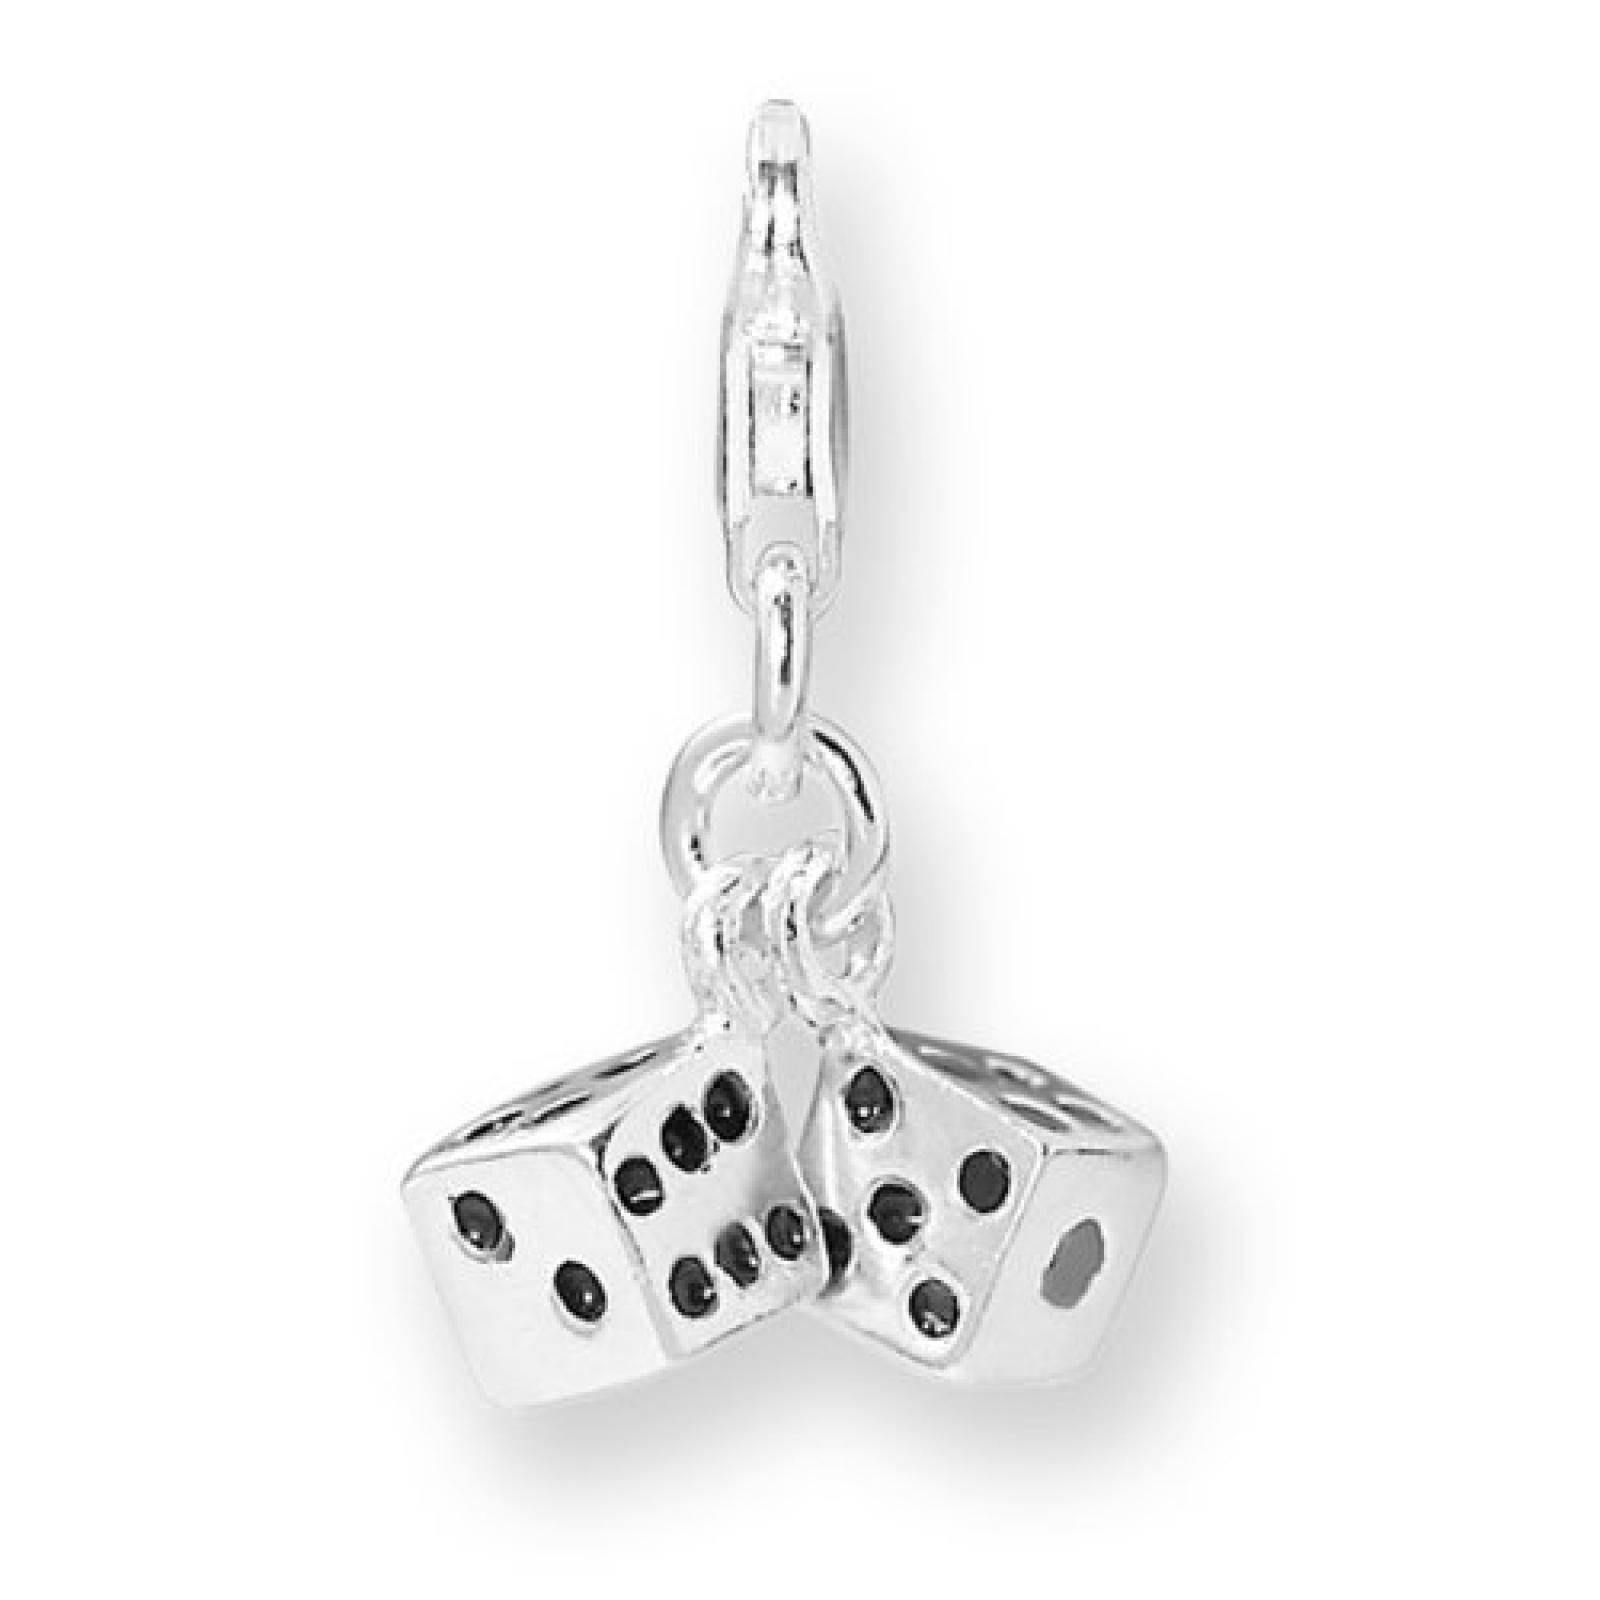 Rafaela Donata Charm Collection Damen-Charm Würfel 925 Sterling Silber  60600026